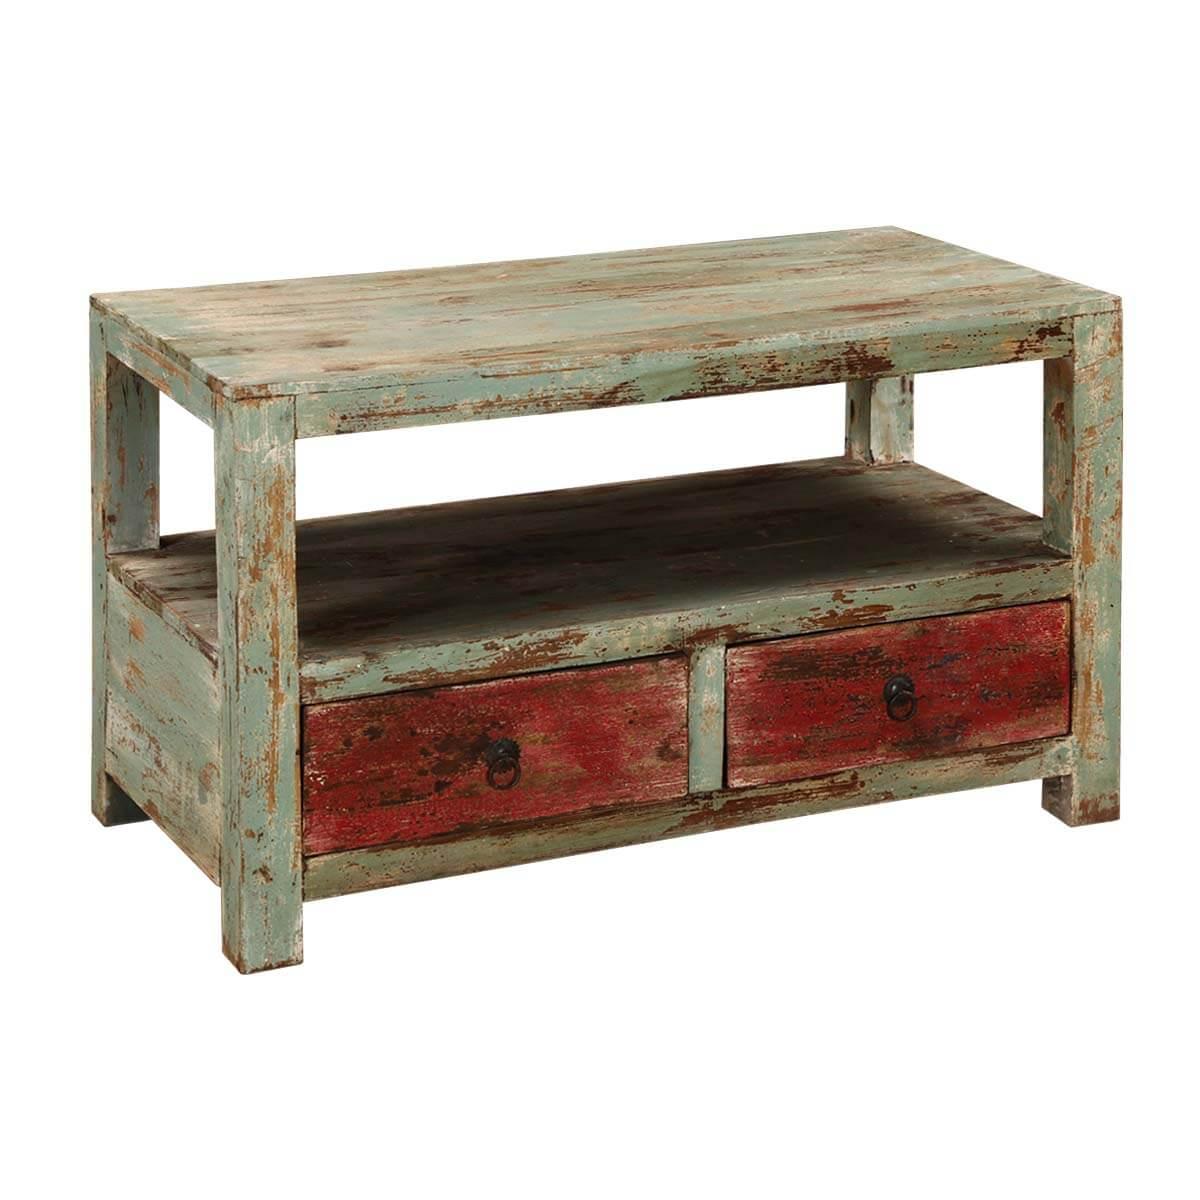 Appalachian Rustic Mango Wood 2 Tier Coffee Table W Drawers